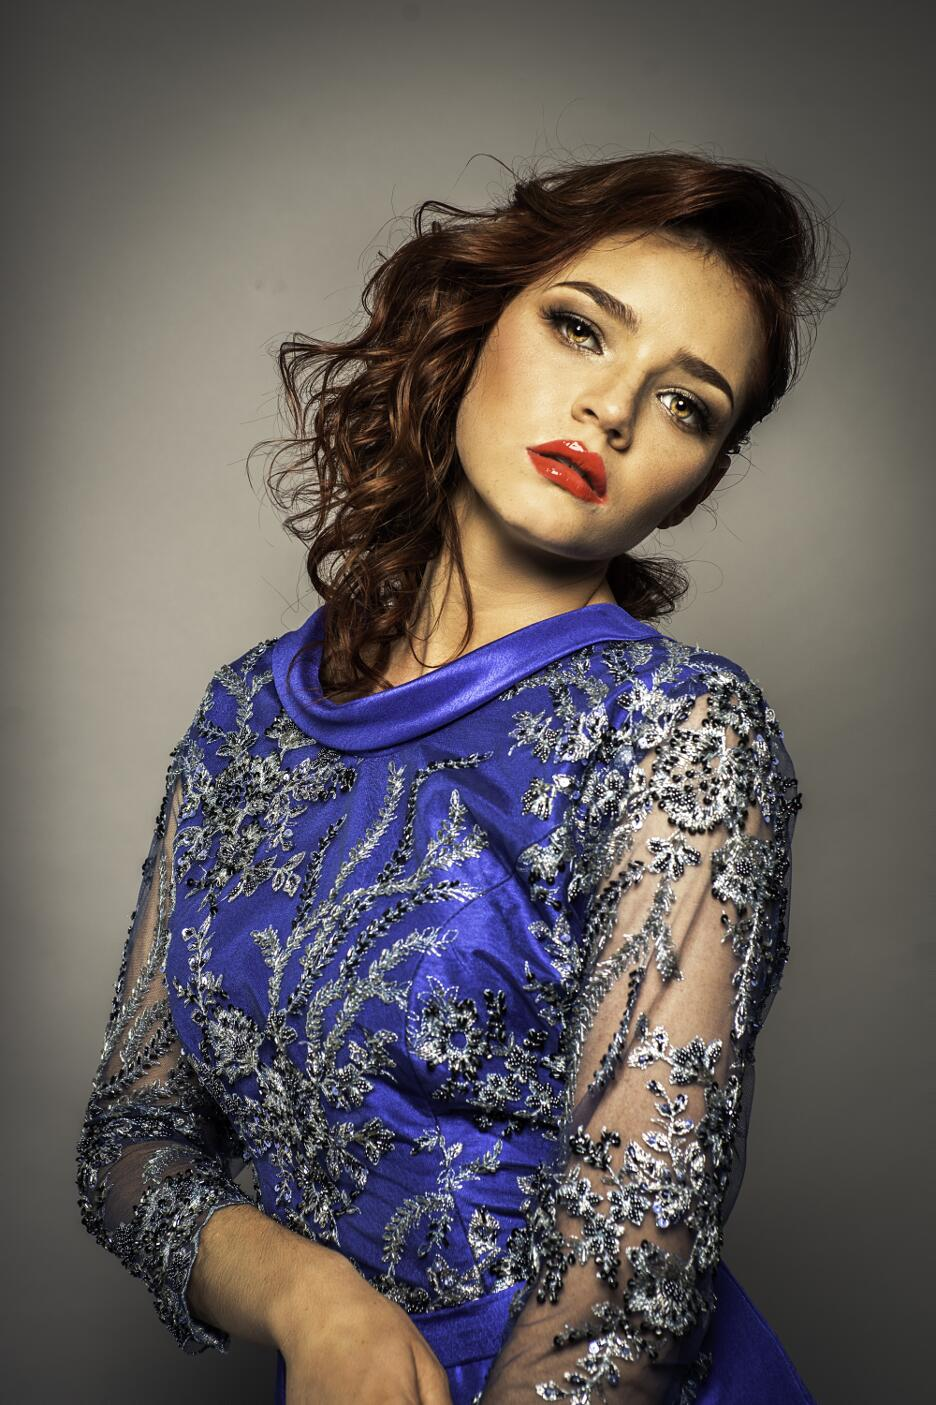 Vestido azul - Jorge Salazar 2019